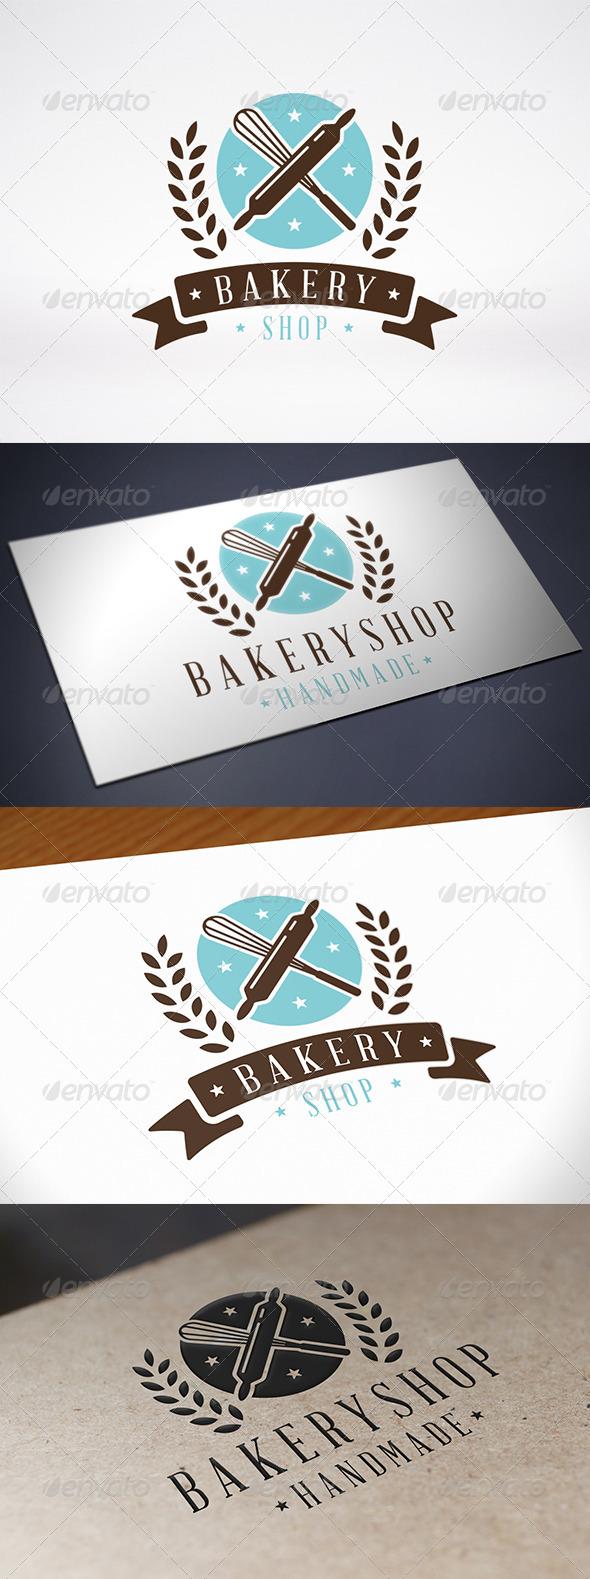 GraphicRiver Bakery Logo Template 8112694